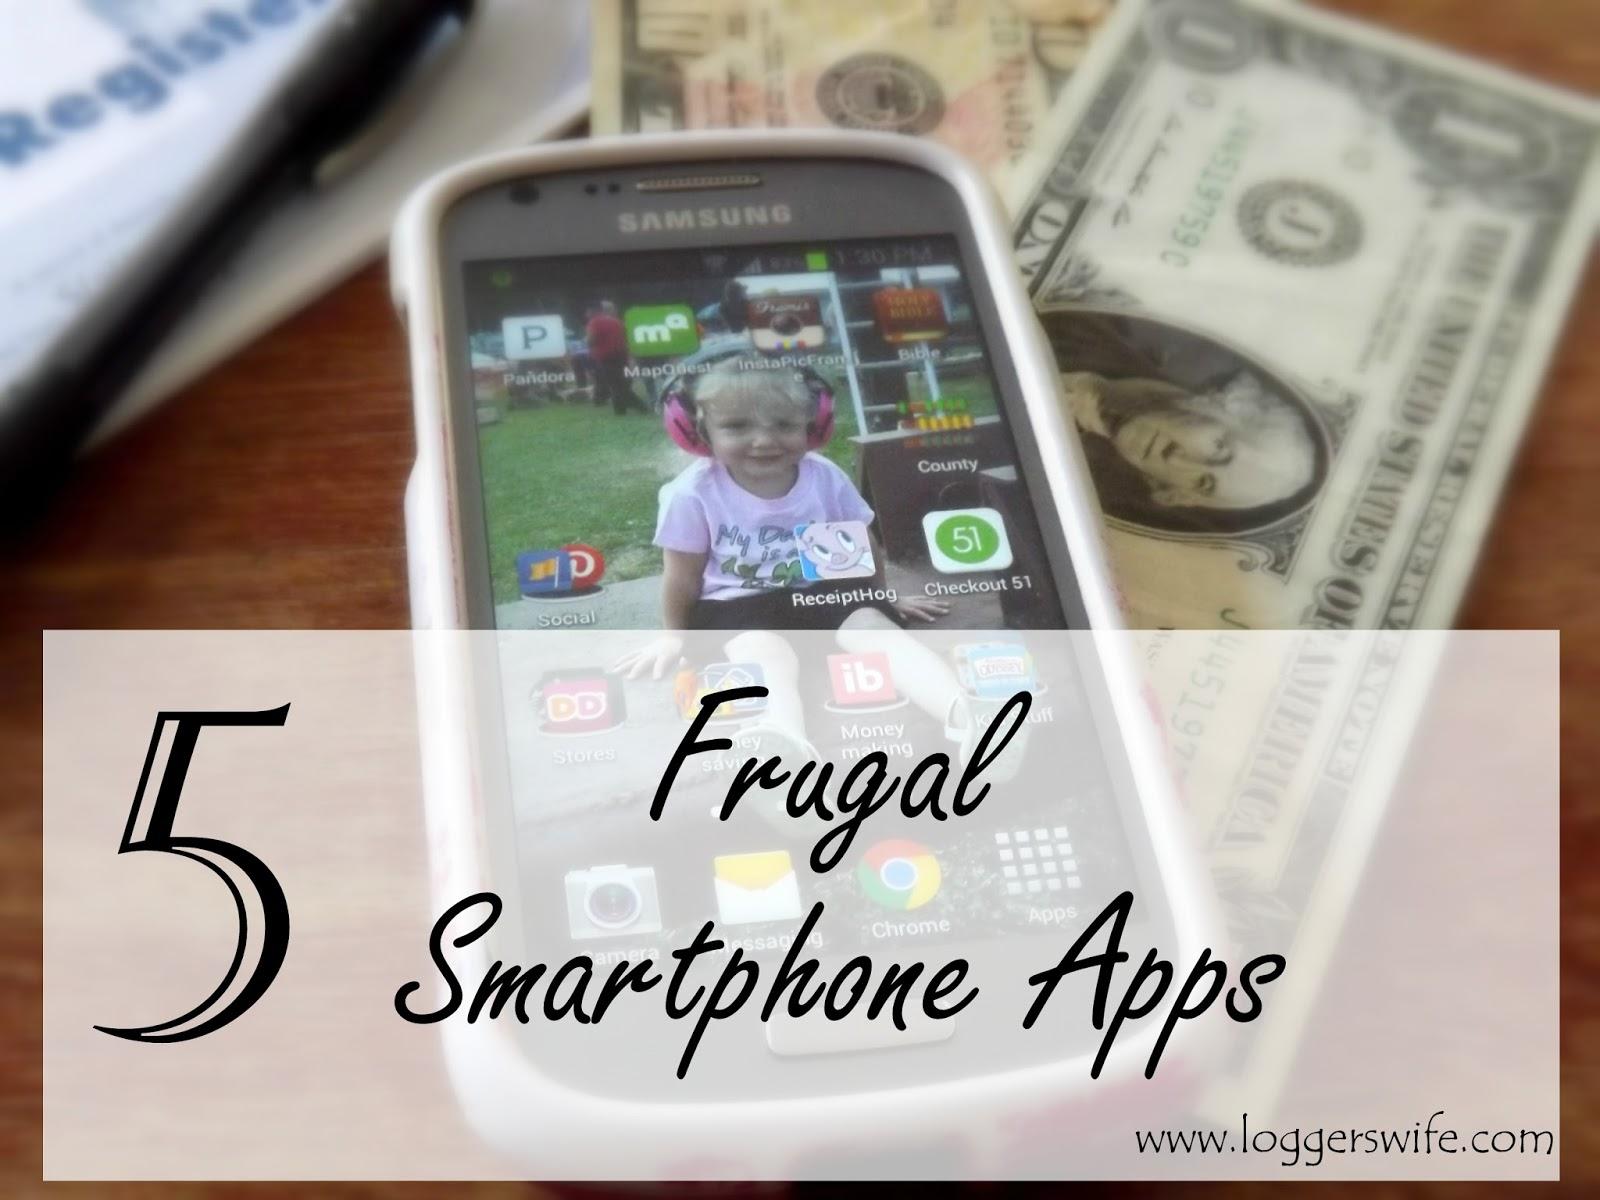 5 Frugal Smartphone Apps